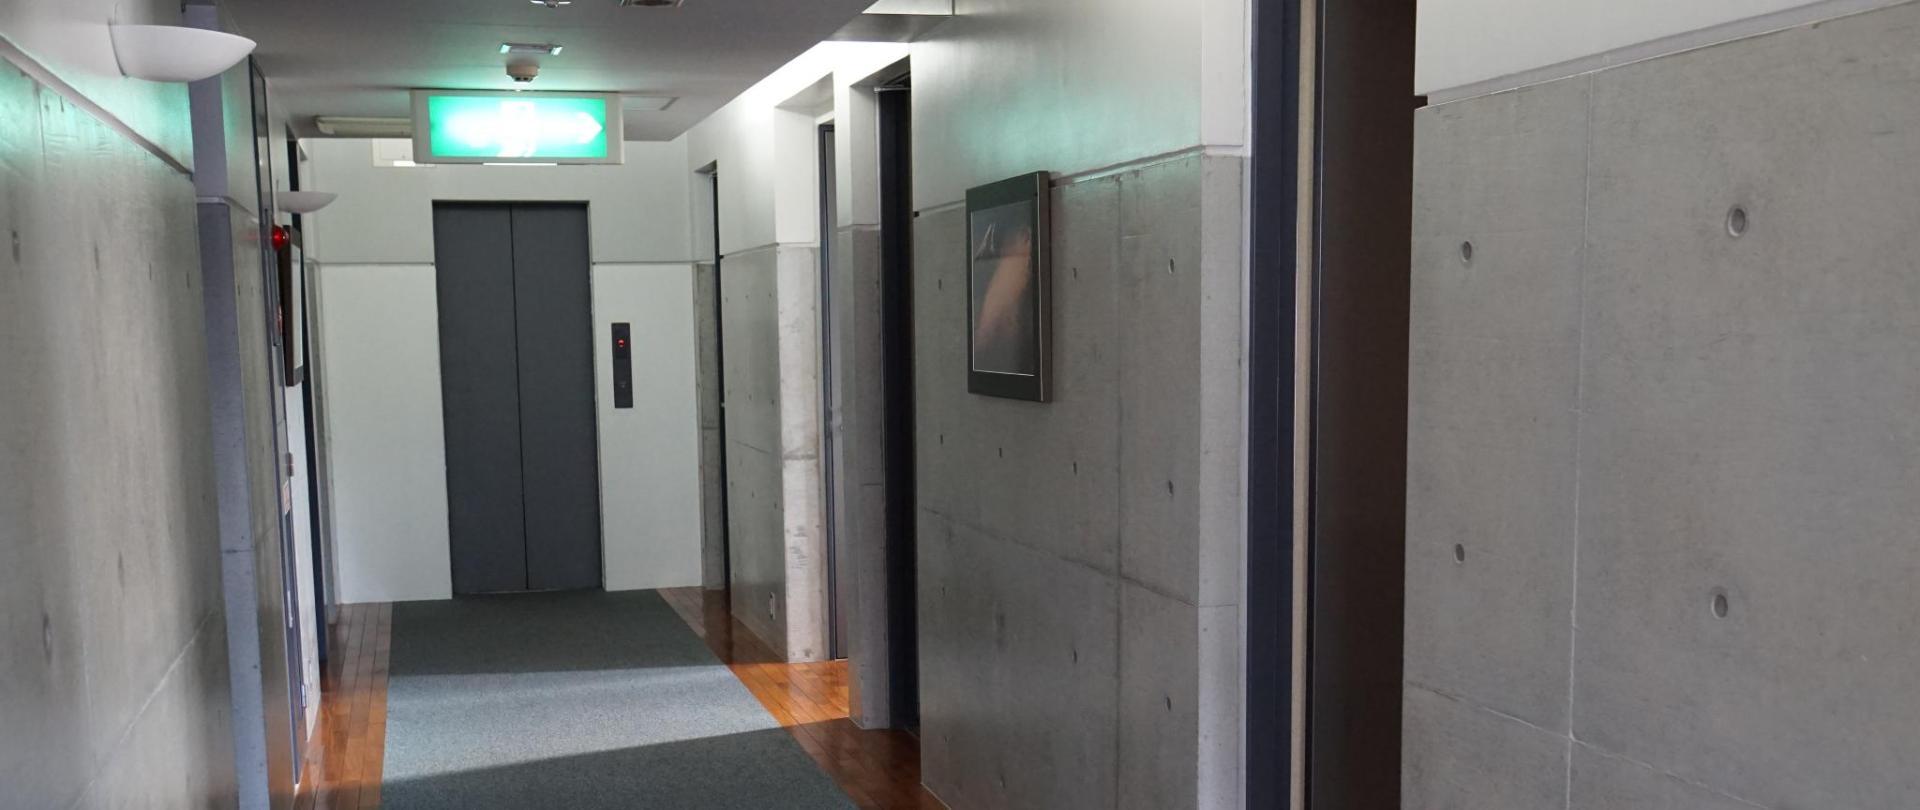 Annex Katsutaro Ryokan